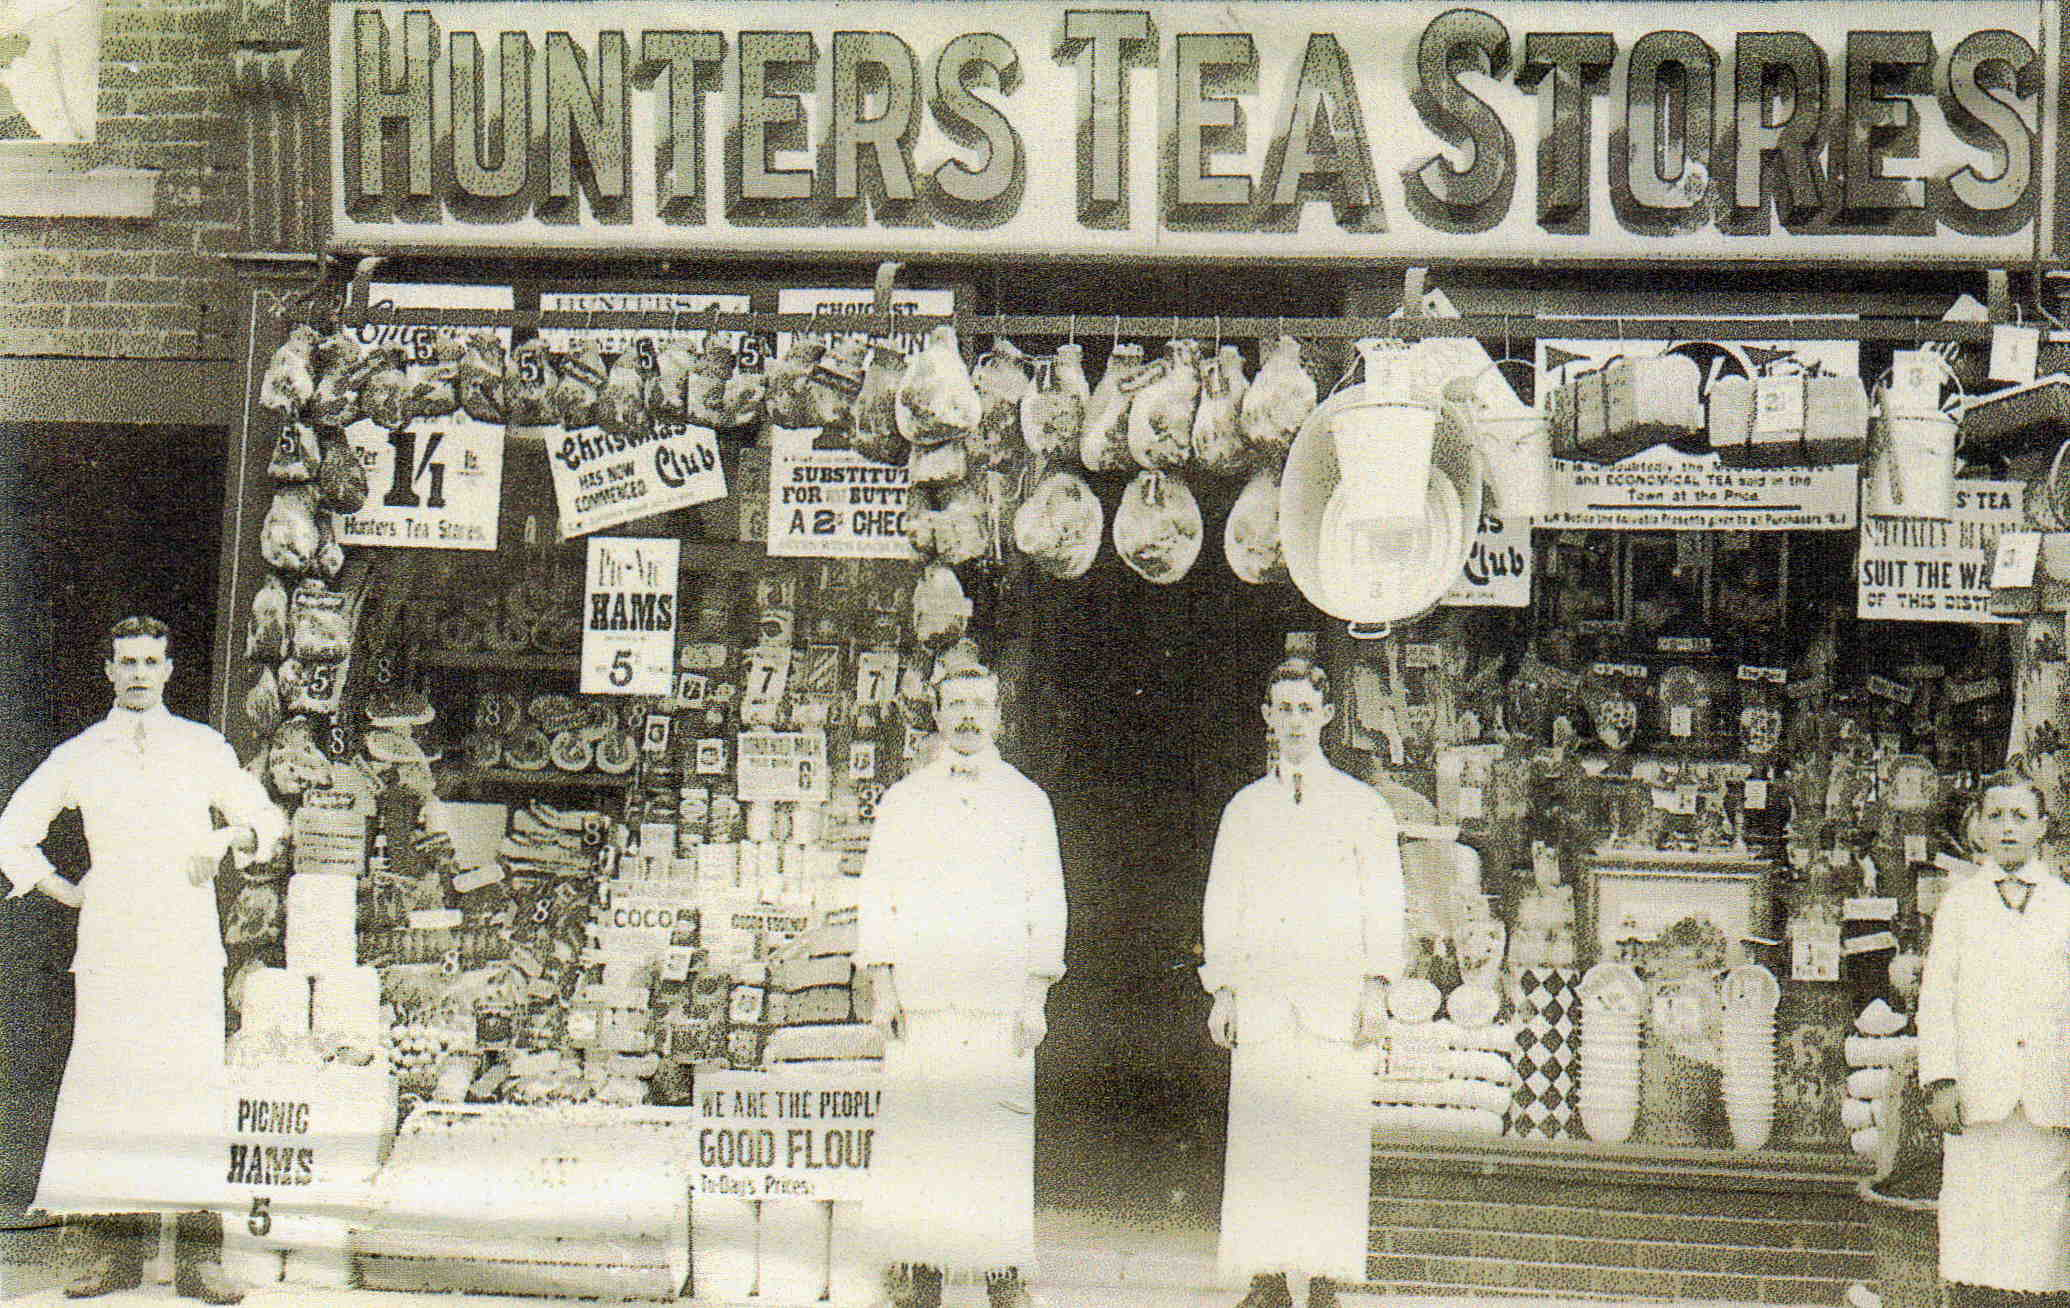 Bridge Street Stores >> Hunters Tea Stores 25 Bridge Street 1920 Later Became